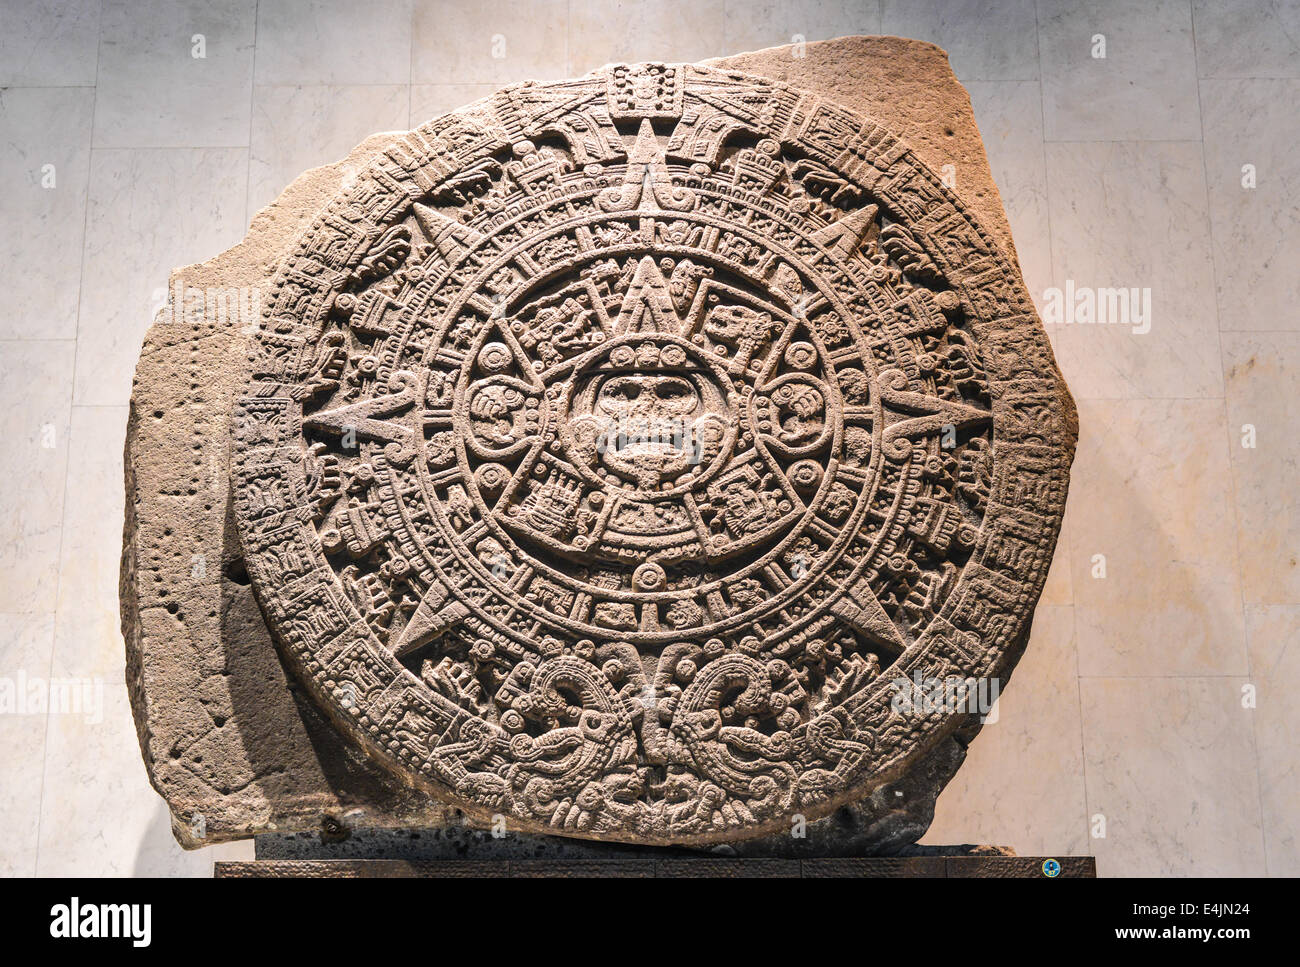 the aztec calendar mexica sun of the